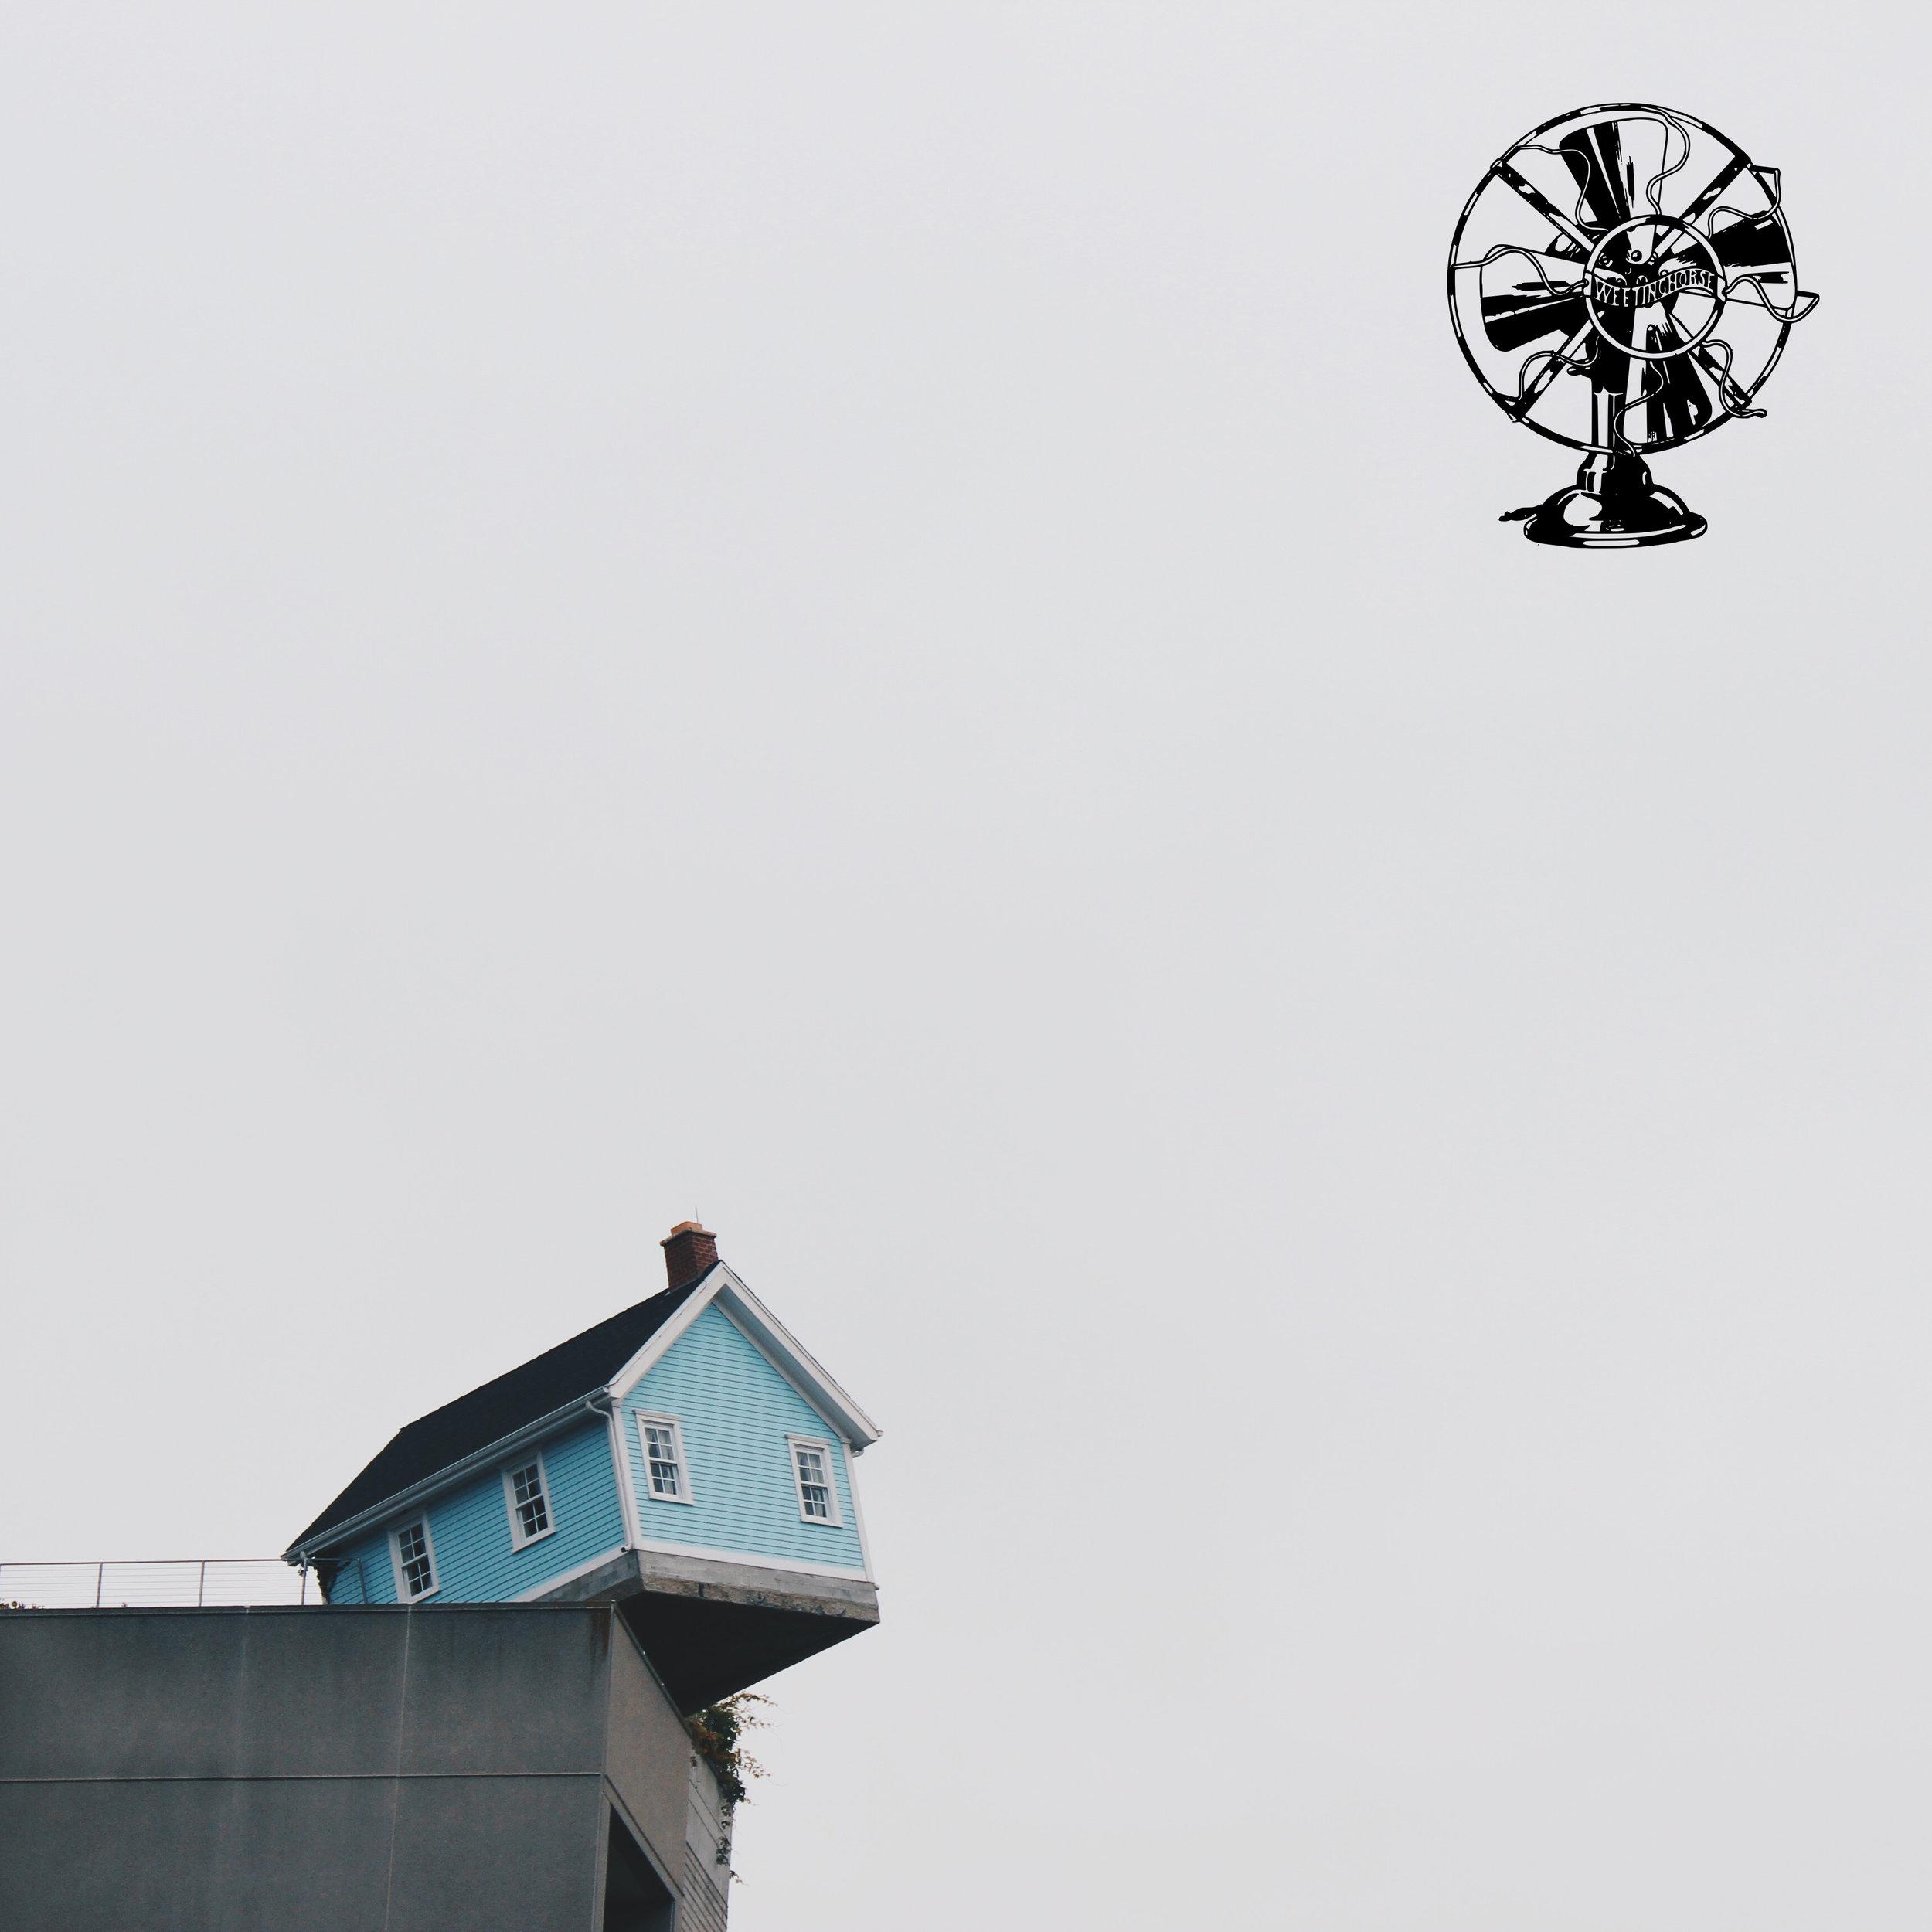 Episode 106's cover: a house on the edge of a precipice.